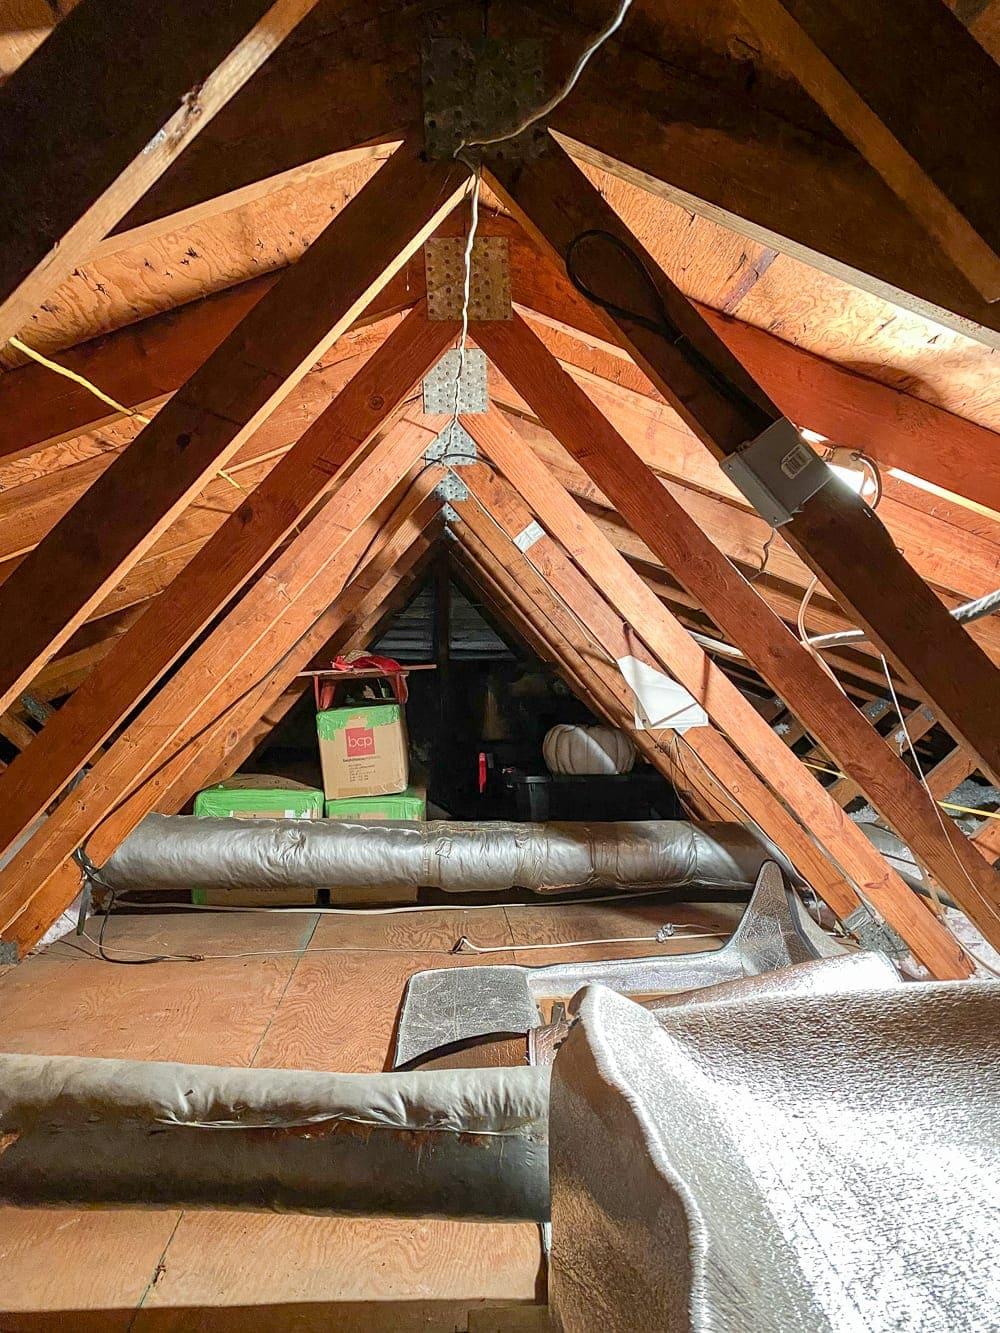 attic storage and seasonal storage bins